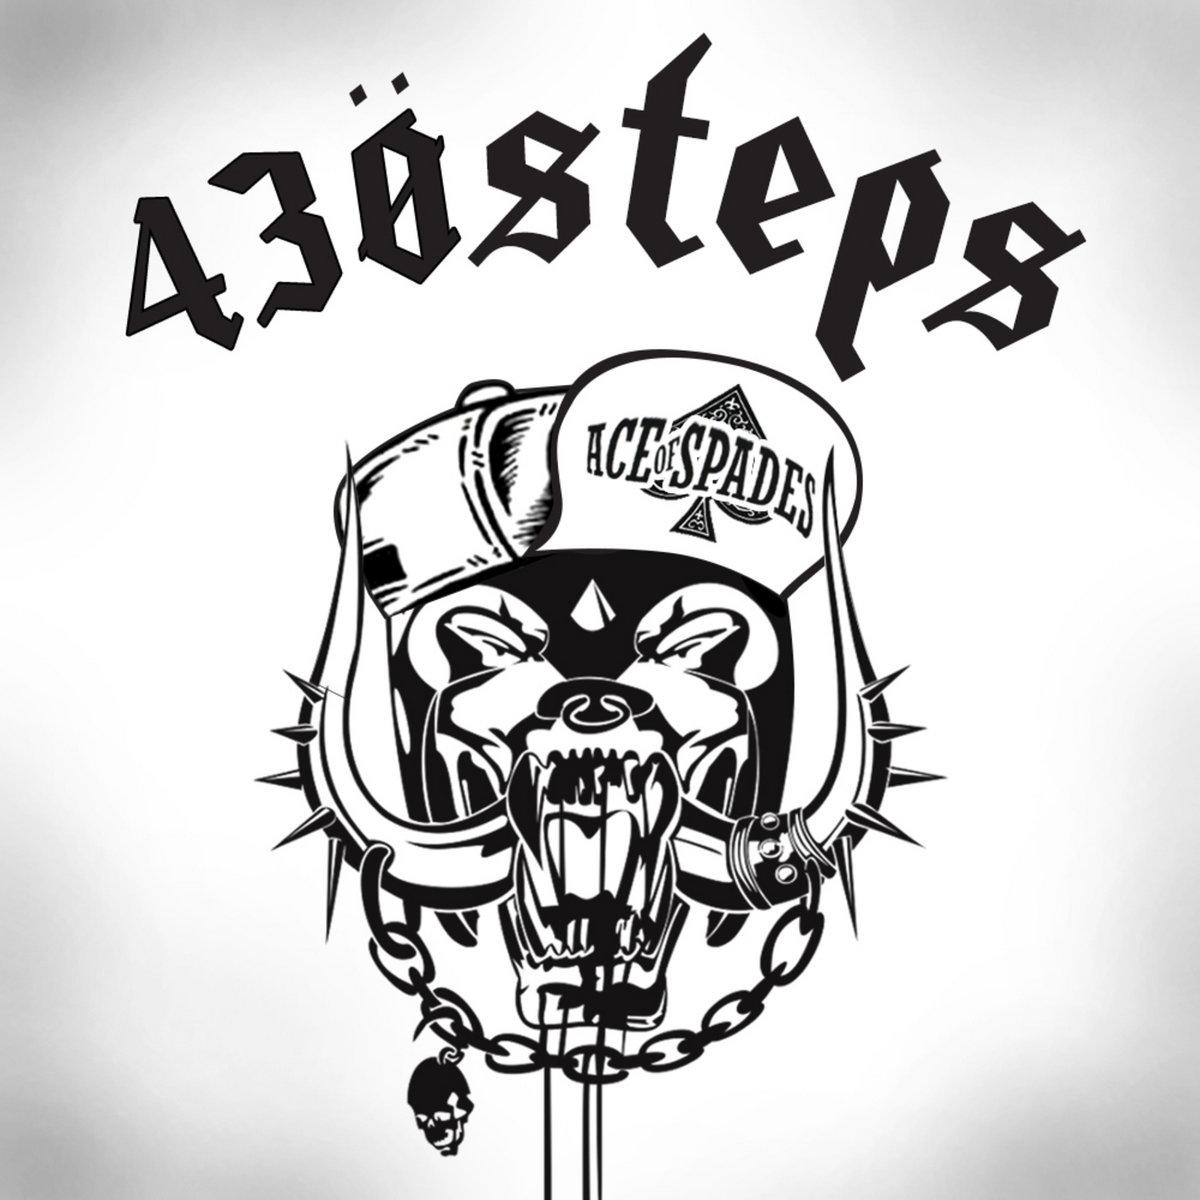 By 430 steps